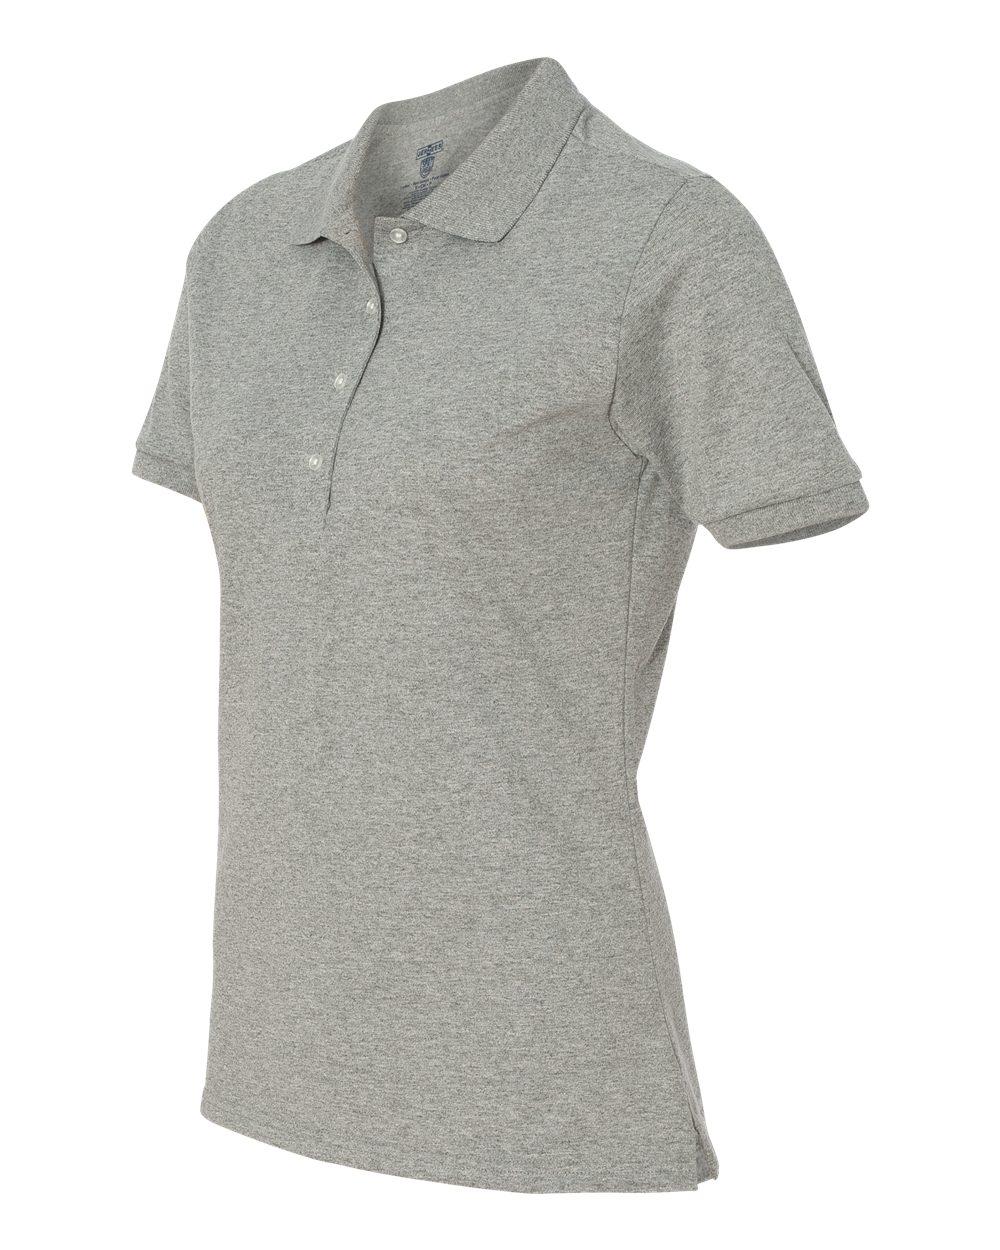 Jerzees-Womens-5-6-oz-50-50-Jersey-Polo-with-Spot-Shield-437W-Size-S-2XL thumbnail 48